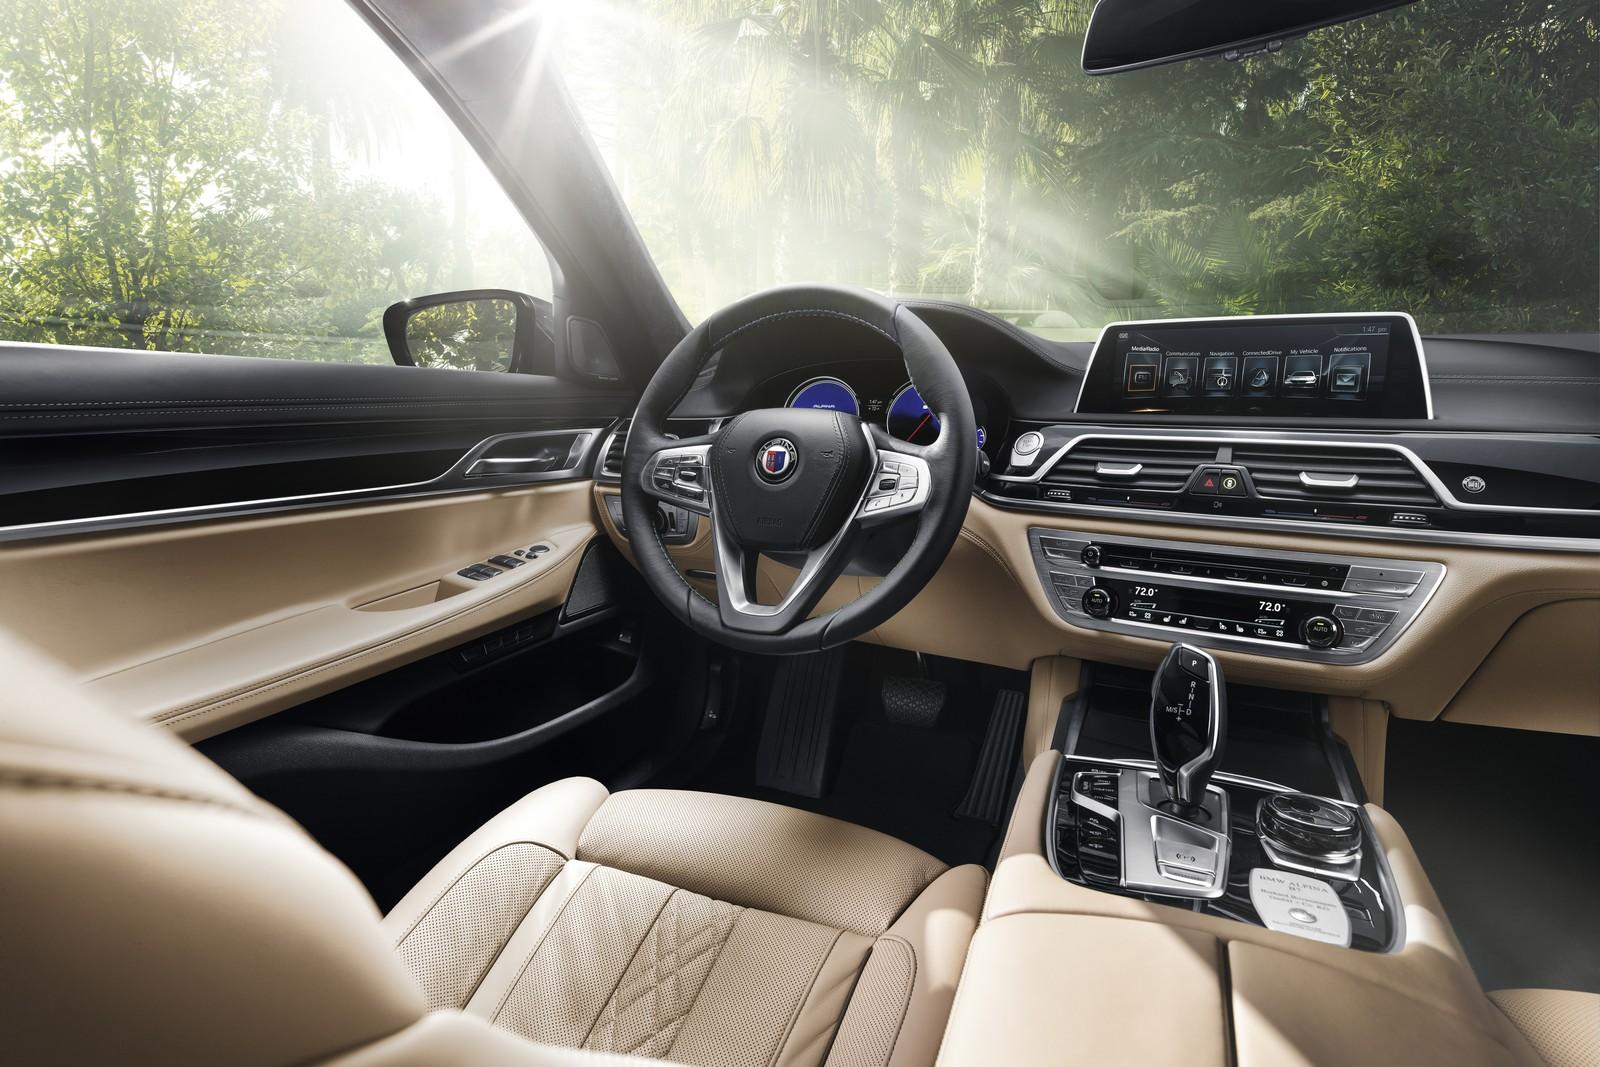 BMW M7 Price >> 2017 Alpina B7 Bi-Turbo revealed, more power than BMW M5 | PerformanceDrive